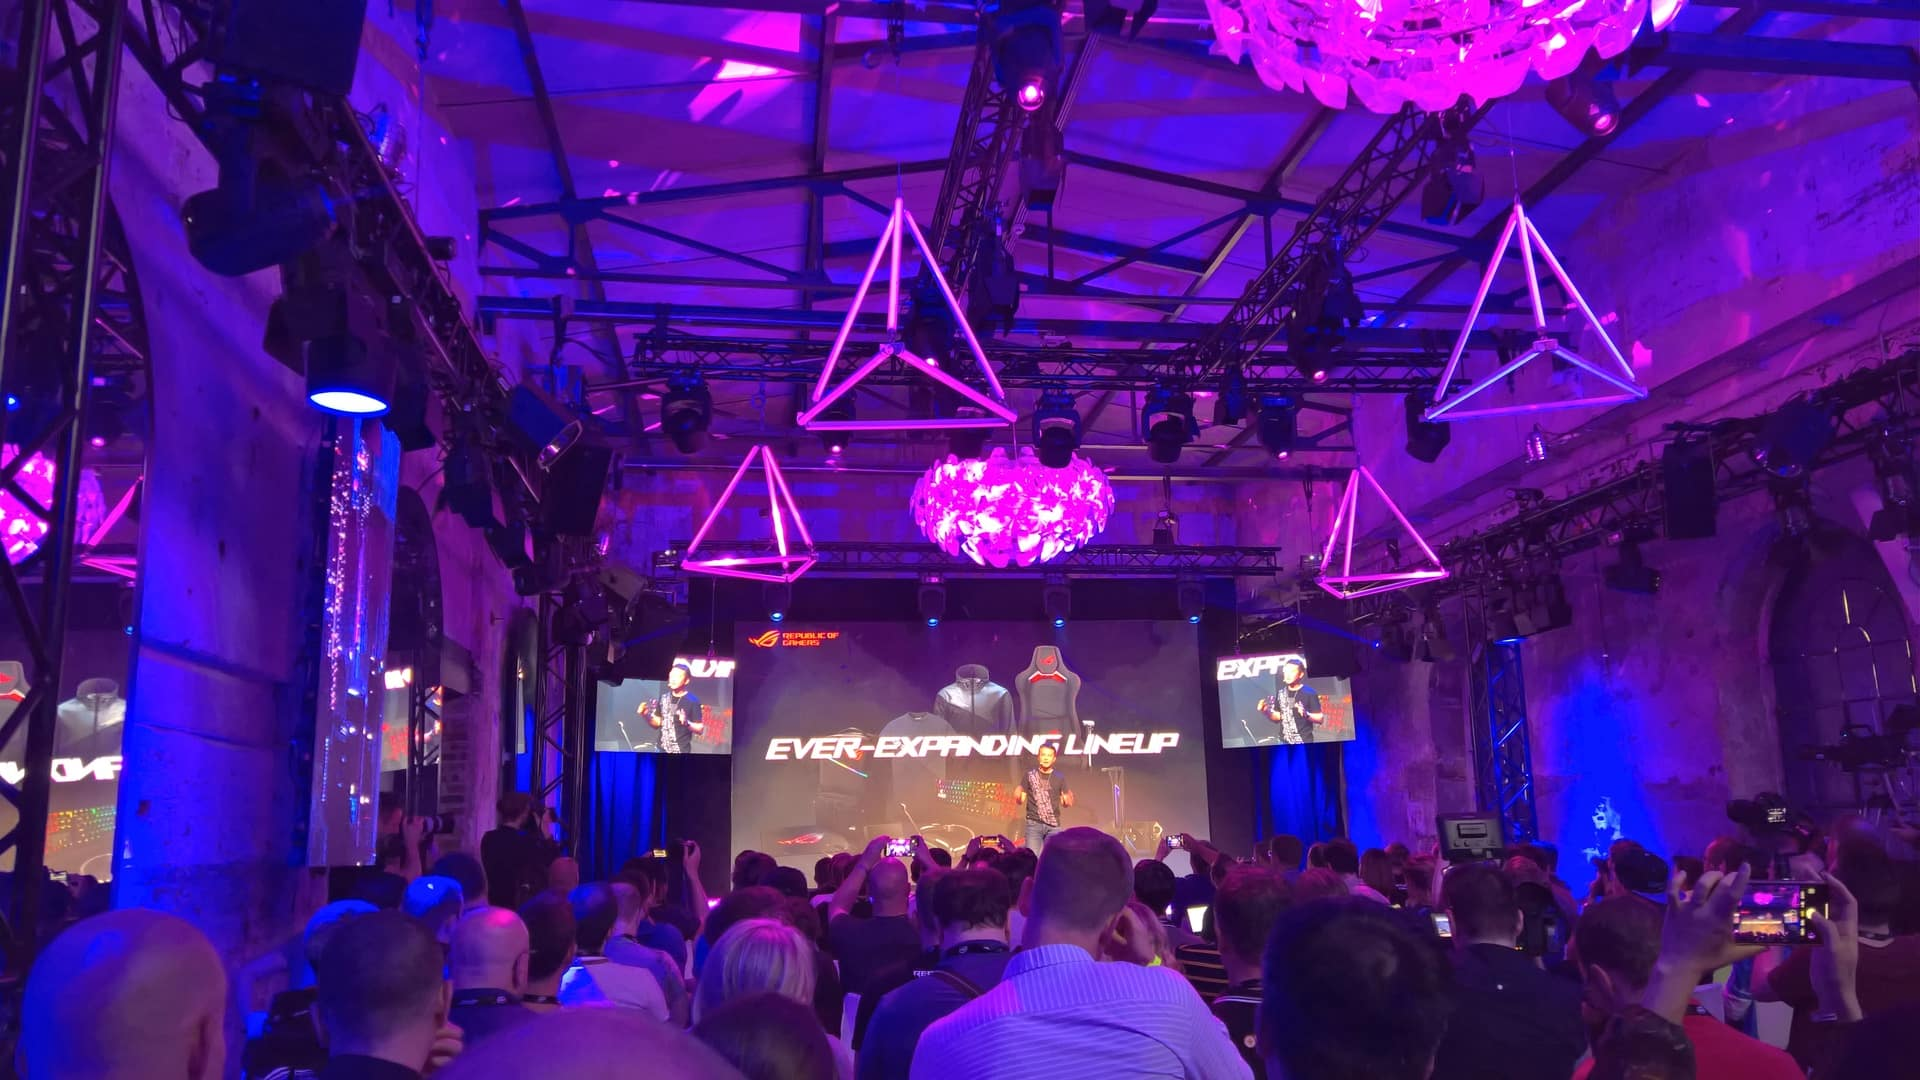 ASUS ROG Evento Gamescon 2019